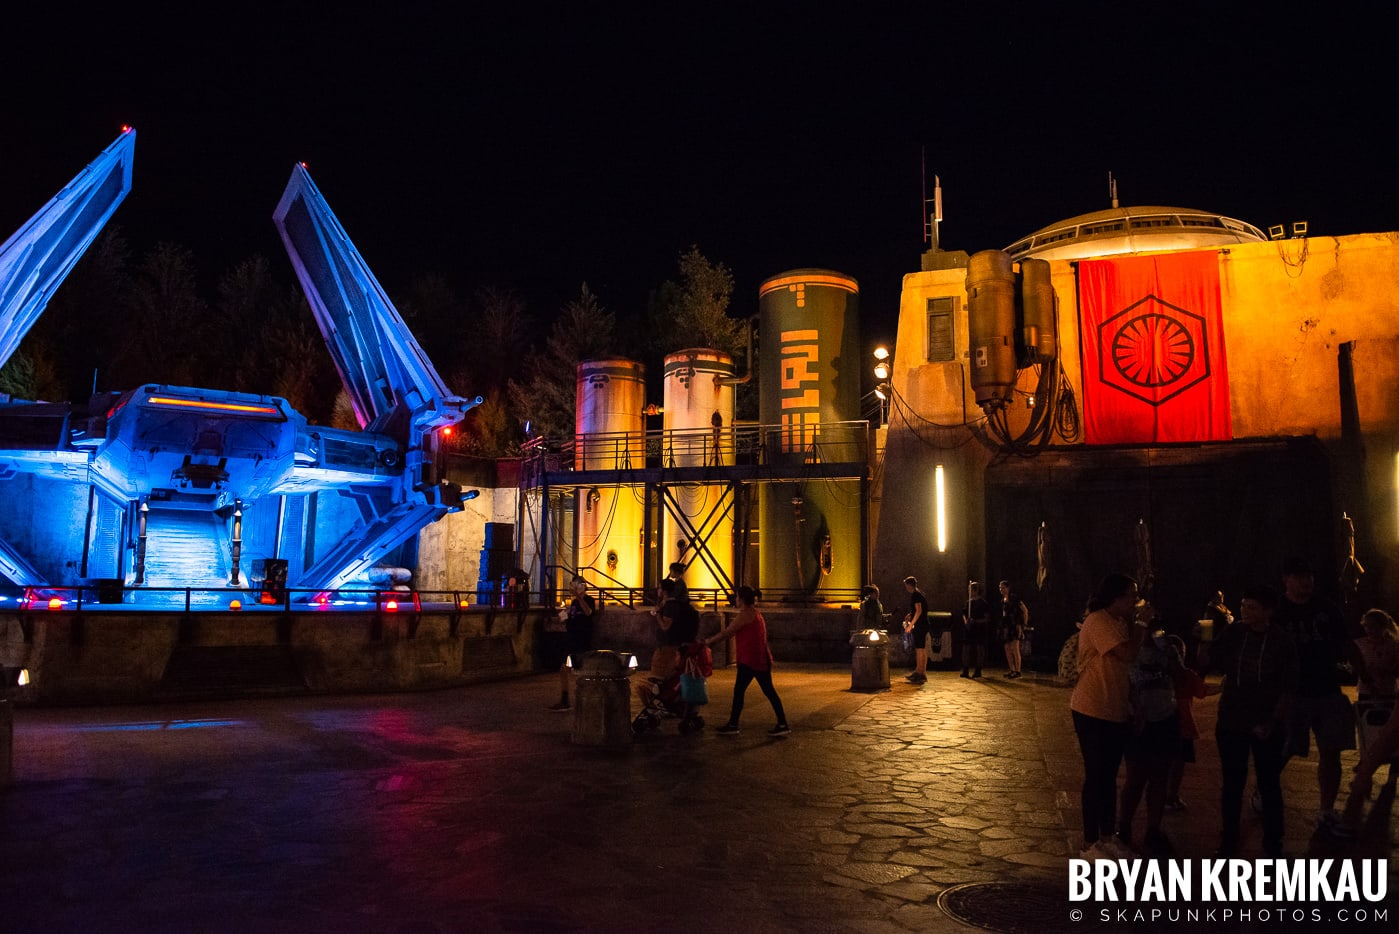 Walt Disney World Vacation: Day 6 (Magic Kingdom, Epcot, Disney's Hollywood Studios) - 10.4.19 (8)